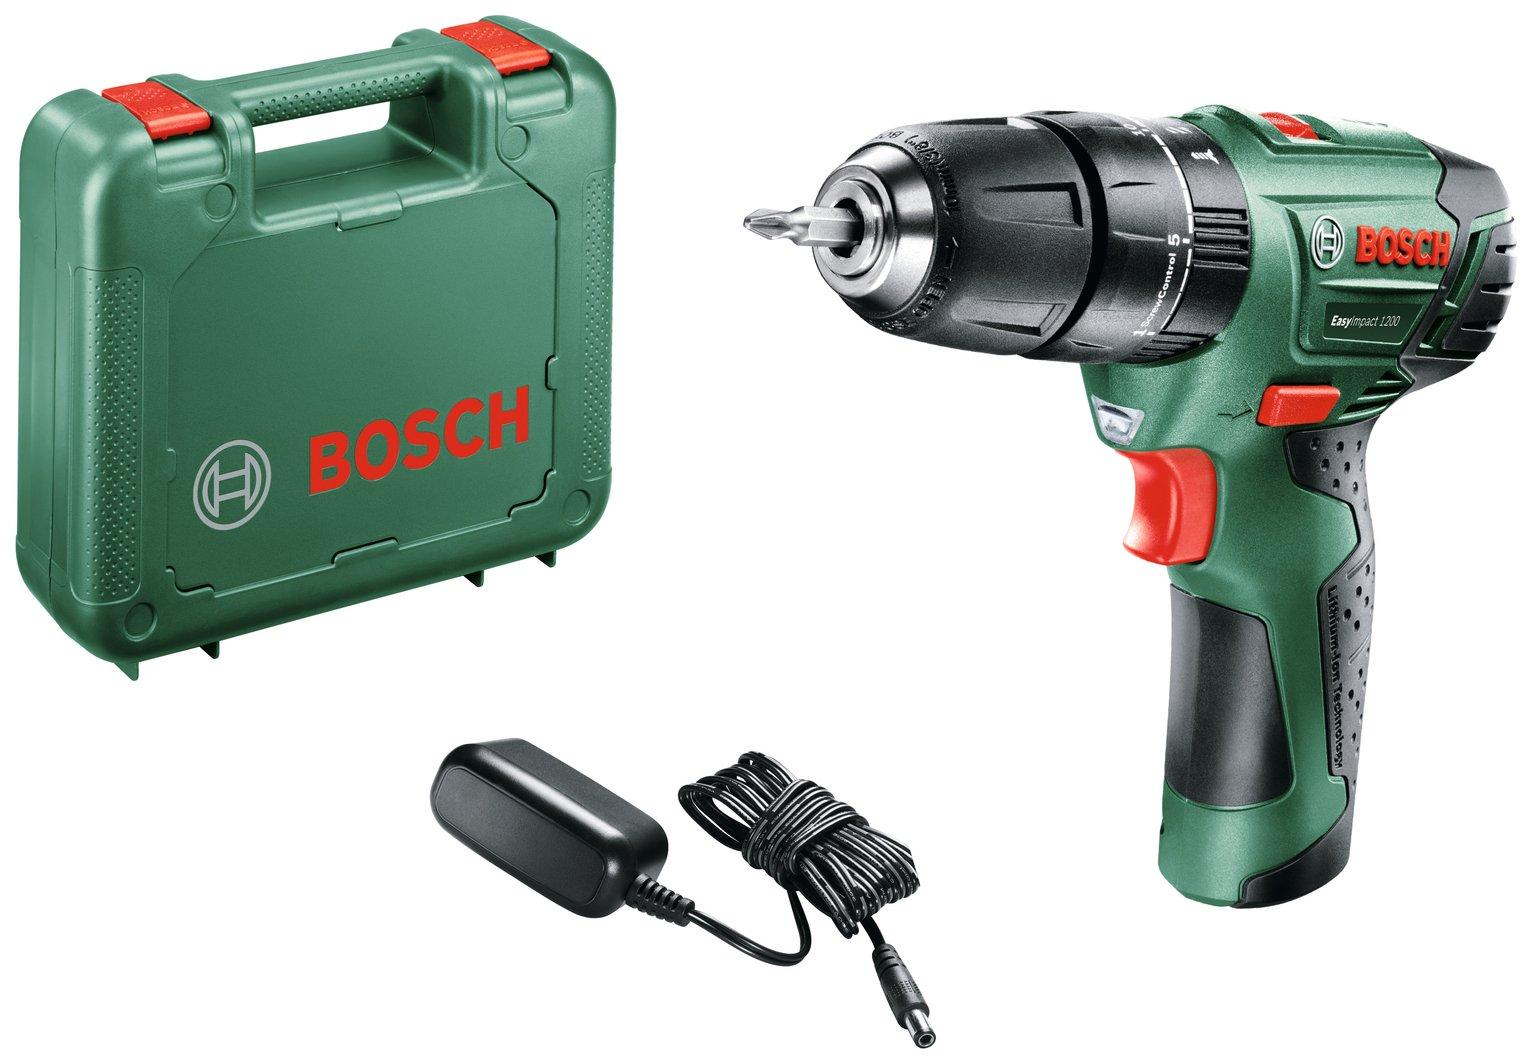 Image of Bosch EasyImpact 1200 Cordless Drill - 12V